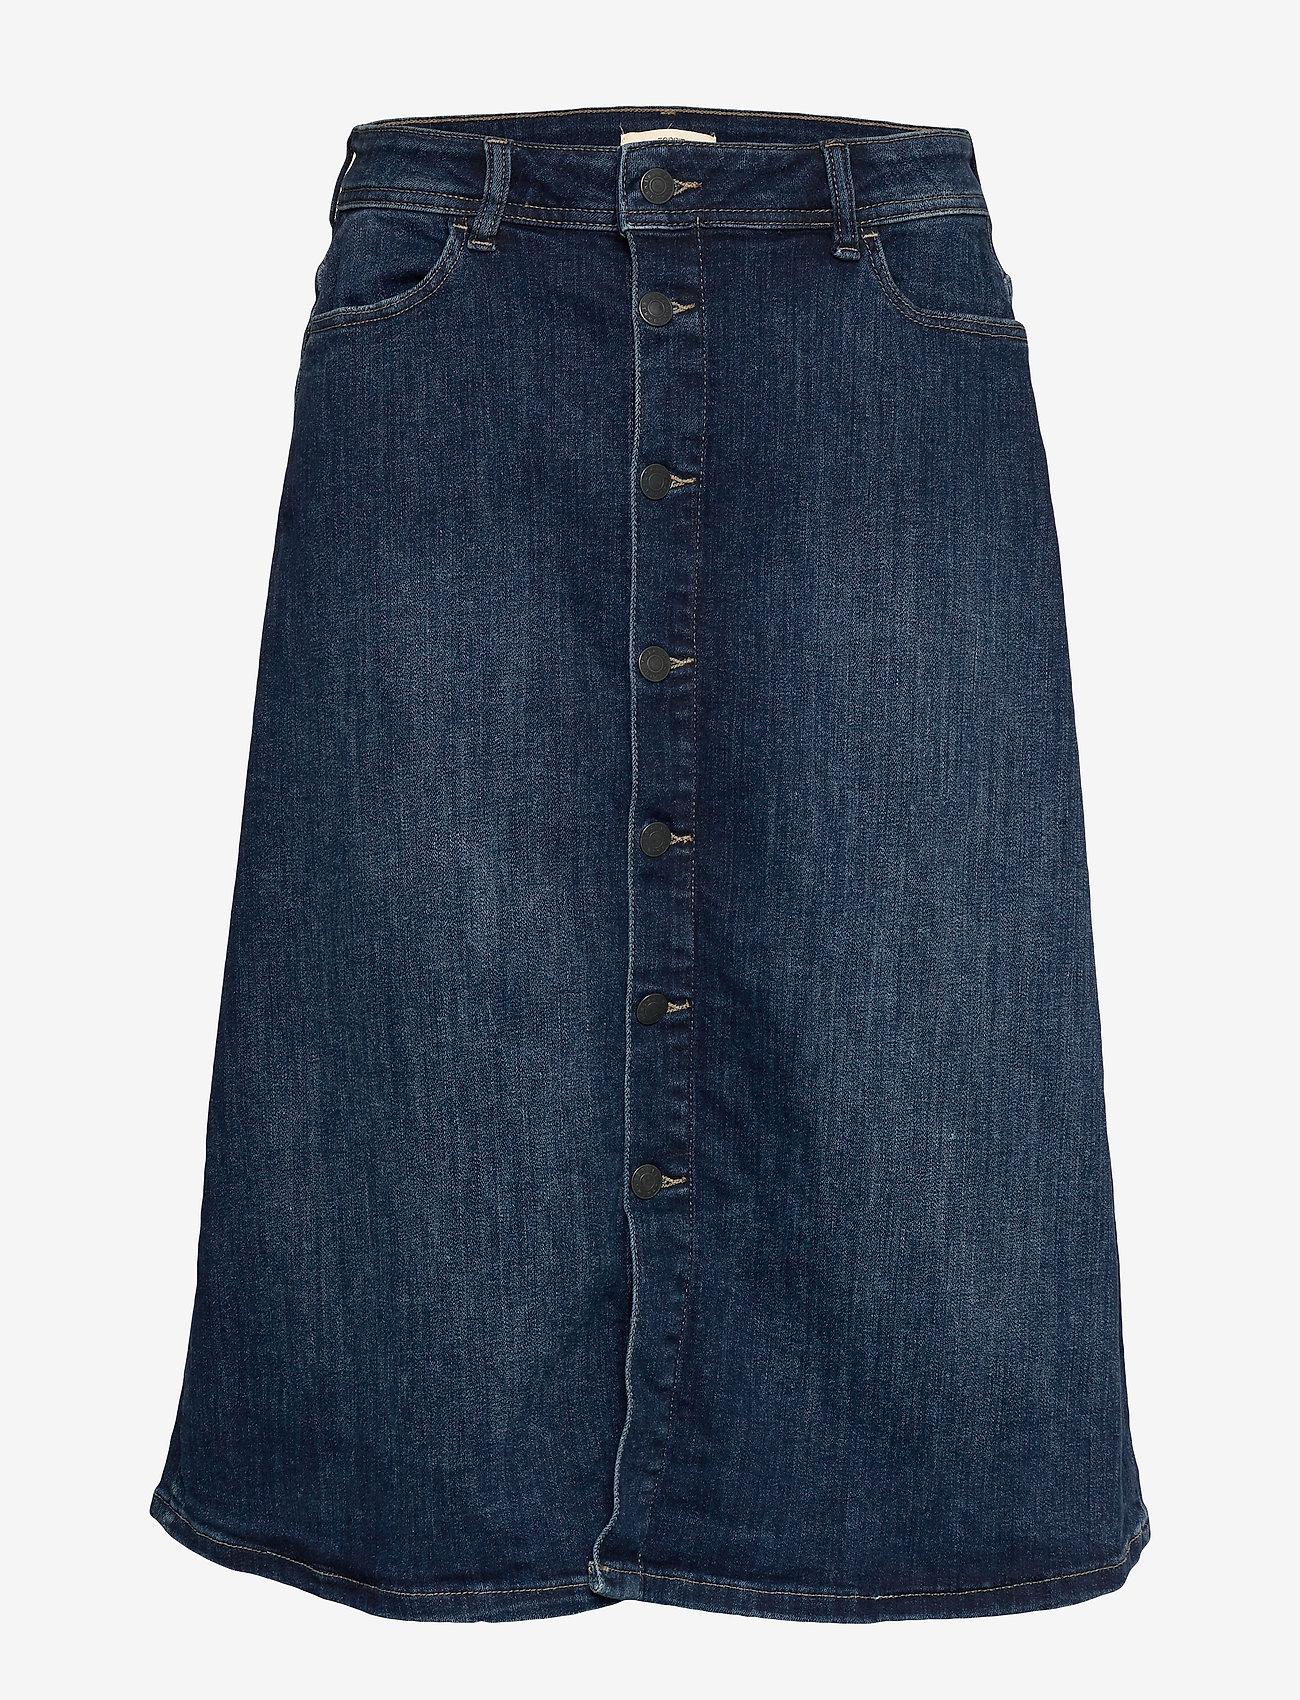 Esprit Casual - Skirts denim - denim skirts - blue medium wash - 0